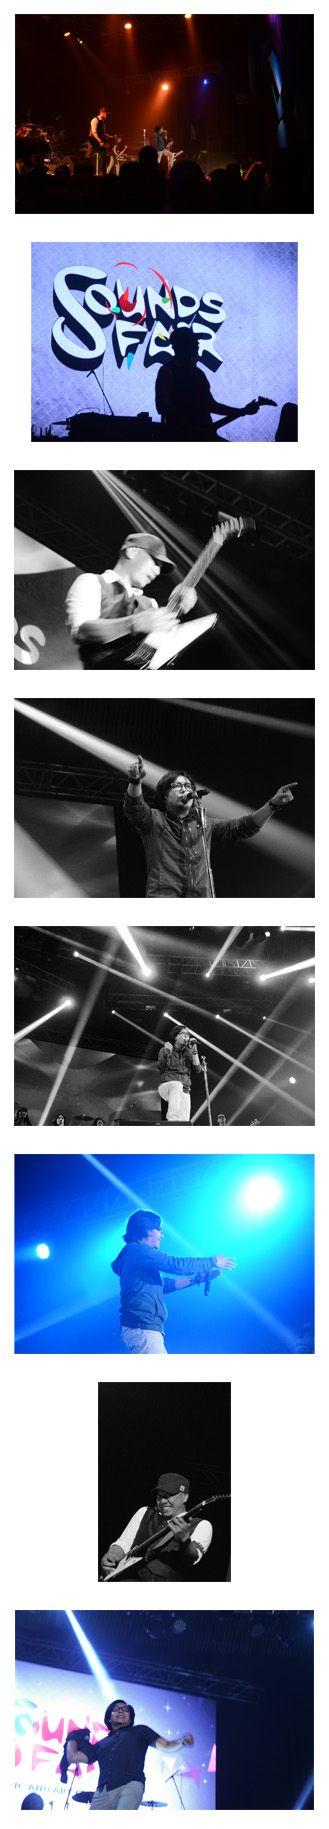 Ari Lasso performance at Java Soundsfair 2014. (10/26)